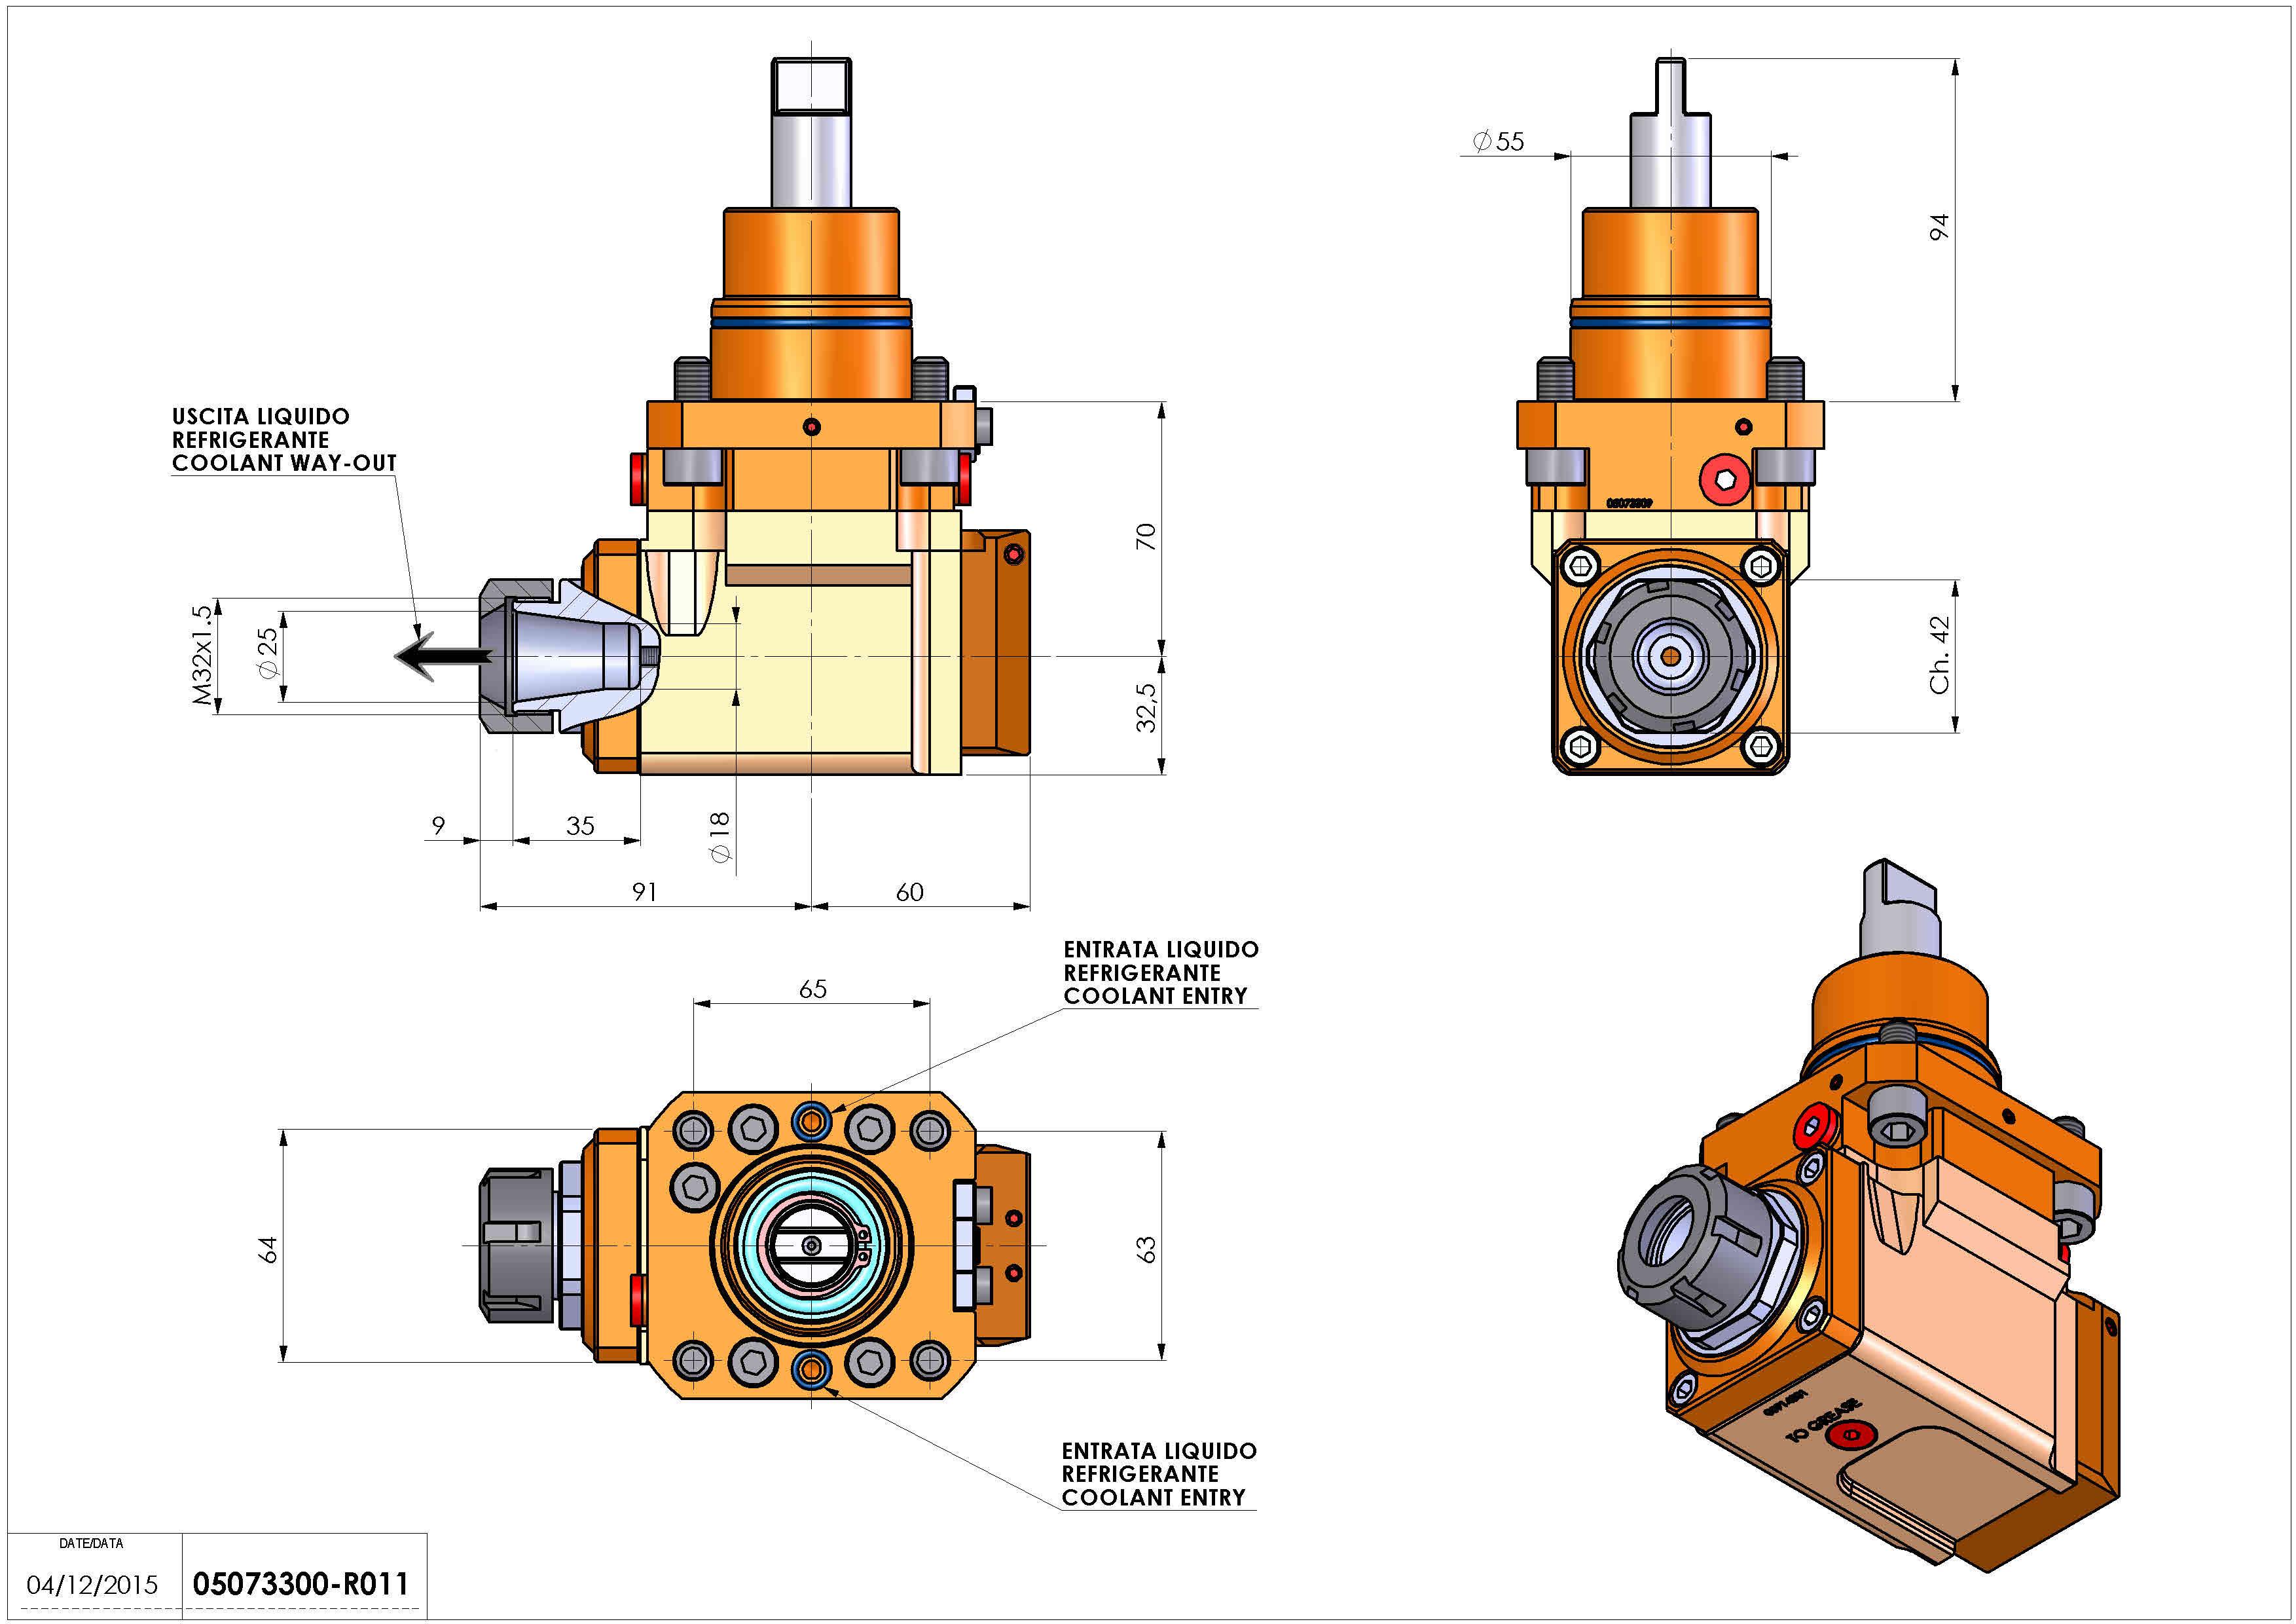 Technical image - LT-A D55 ER25 LR RF H70 BI.